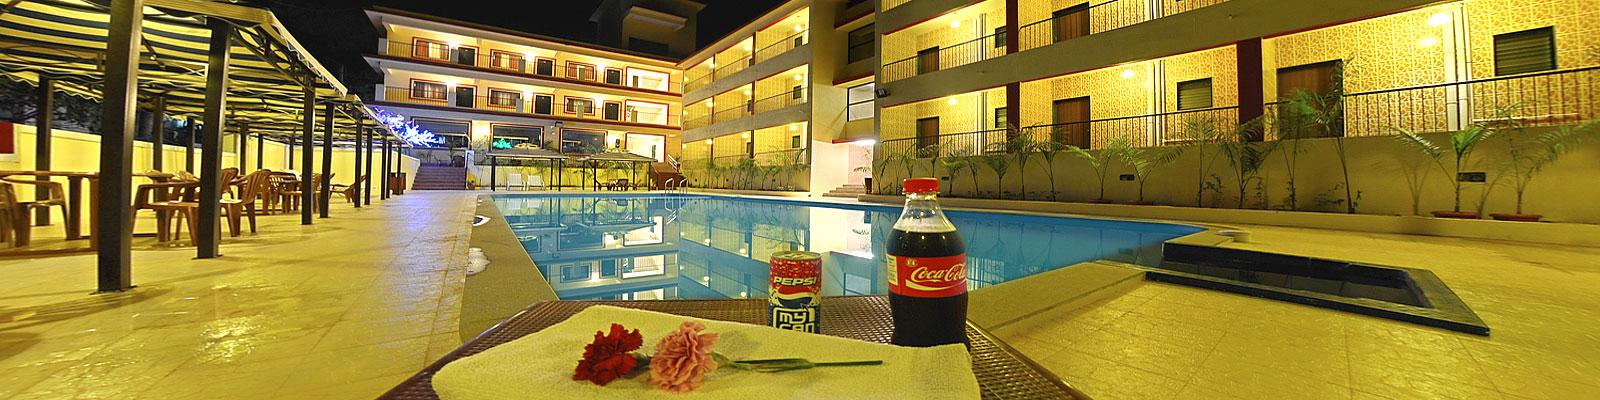 Hotel Resort In North Goa Swimming Pool Pub Bar